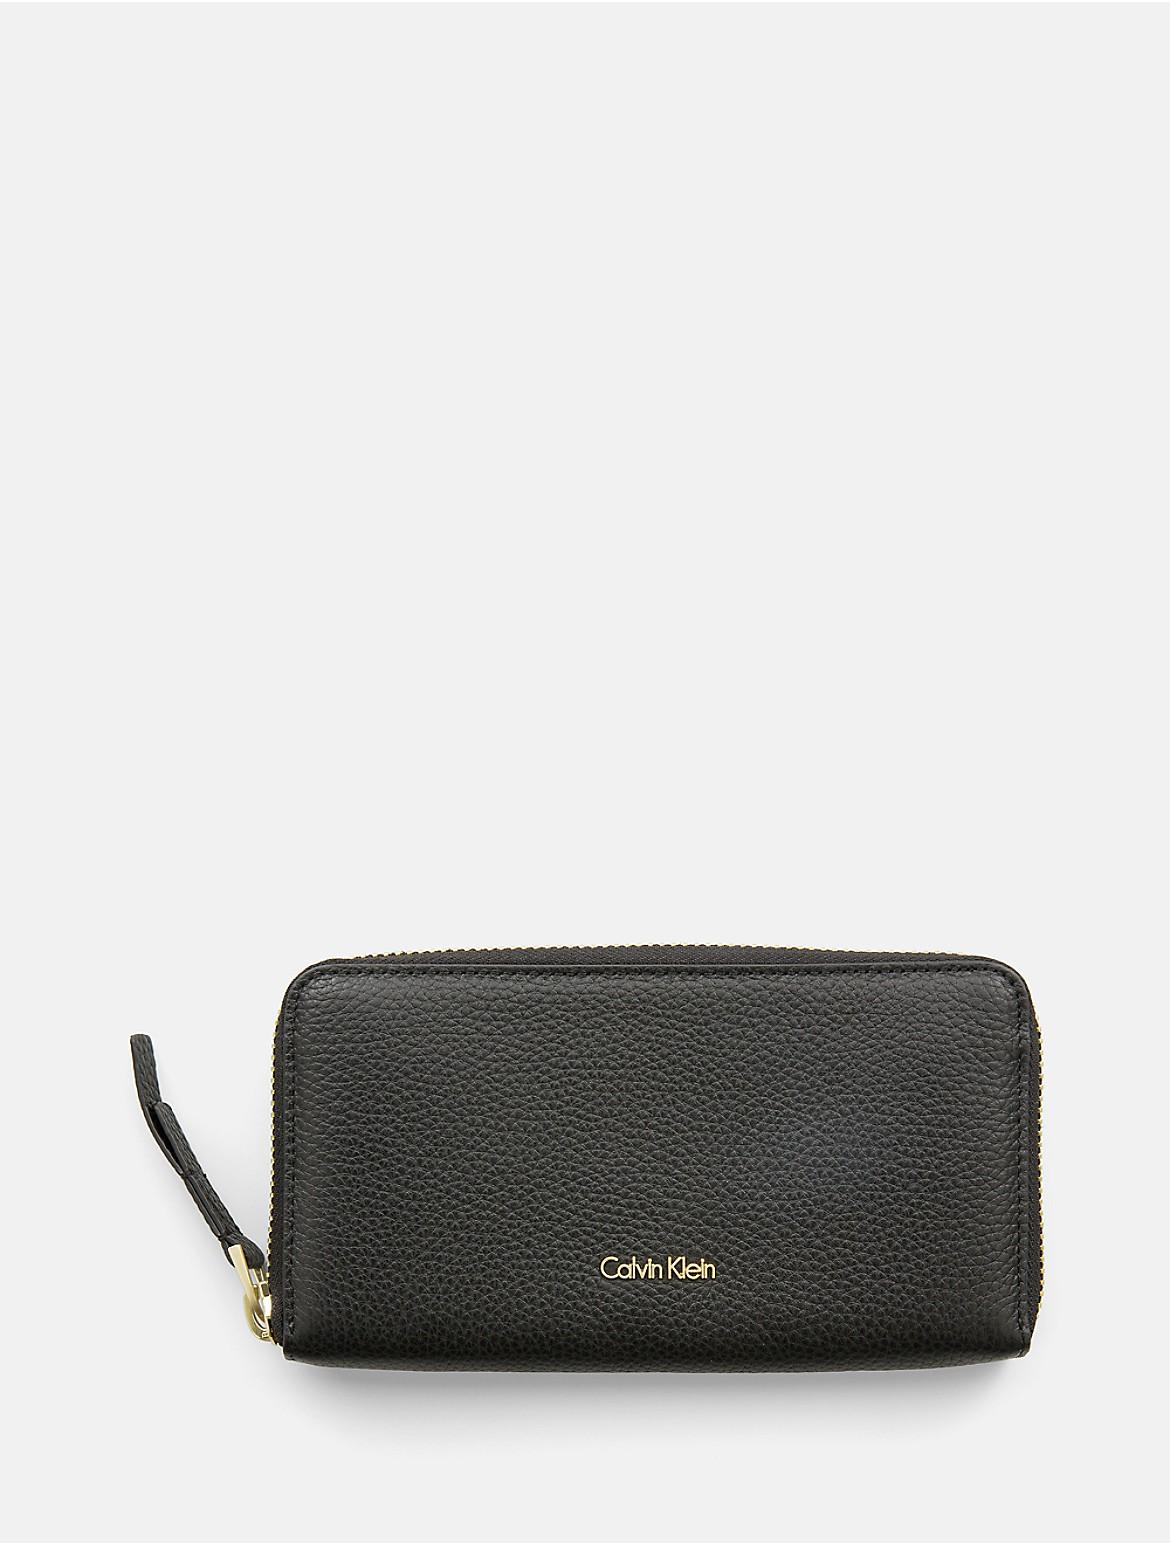 Buy Cheap Good Selling K40K400012 Wallet Women Calvin Klein Buy Cheap Outlet Store Brand New Unisex Online dbcJQ